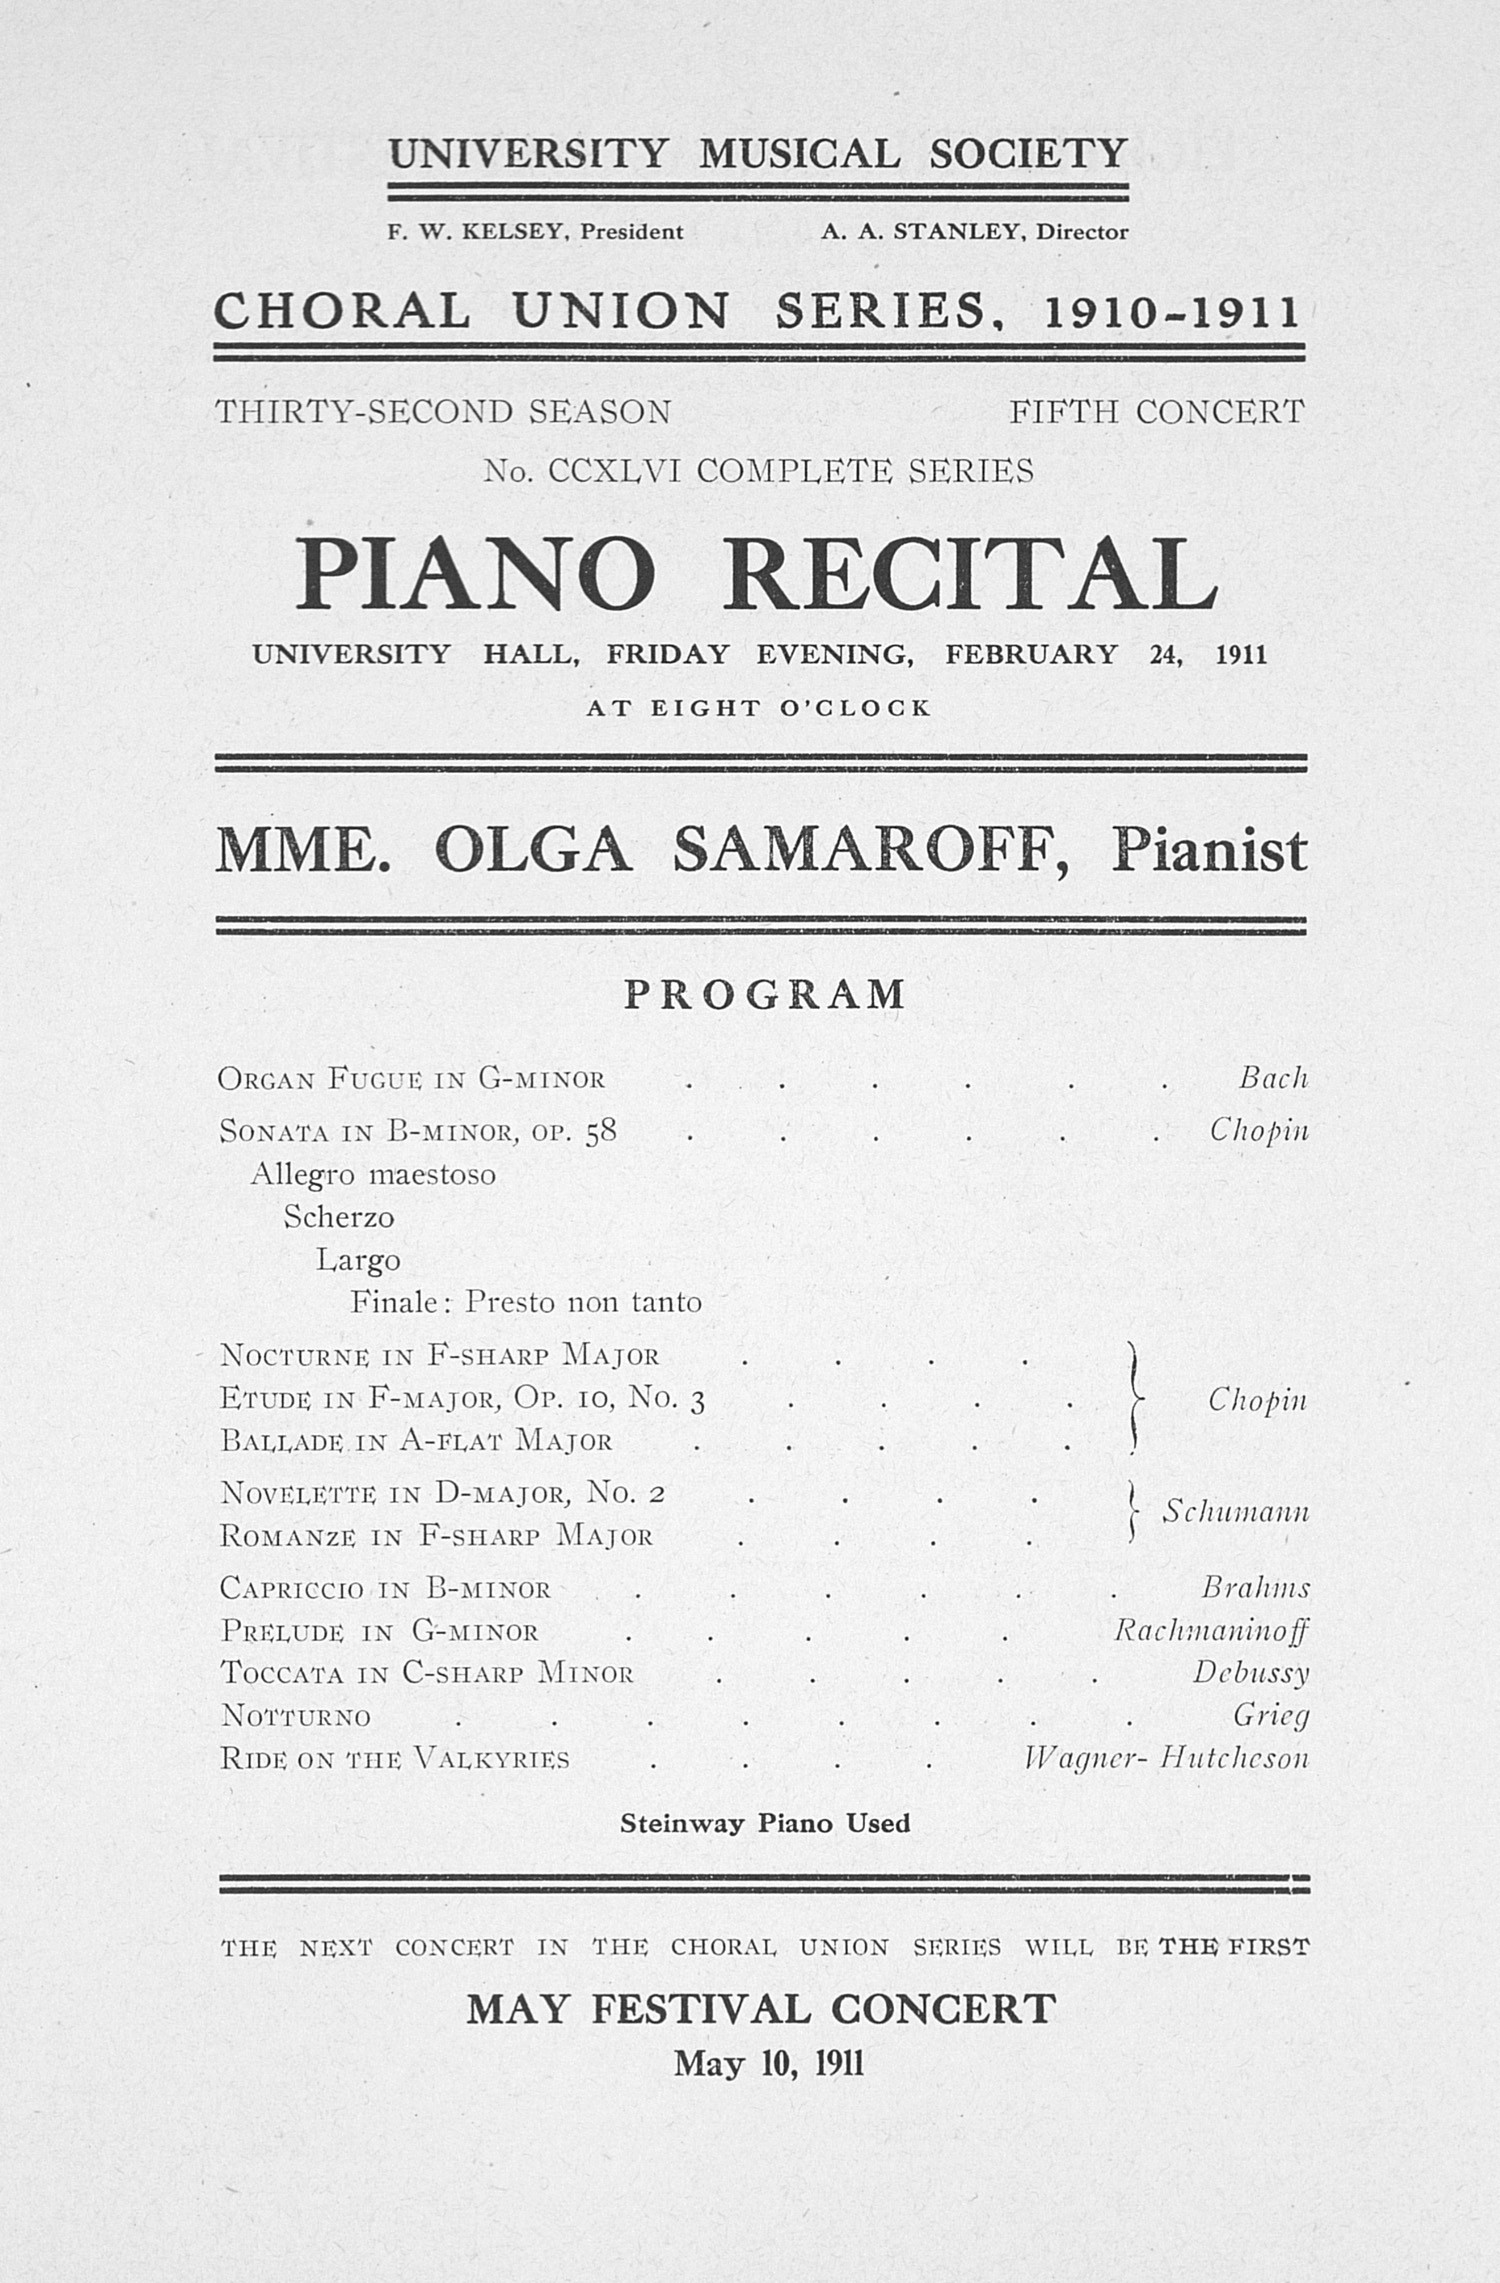 Piano Recital Program Template Free Awesome Piano Concert Program Examples Padinterow Over Blog